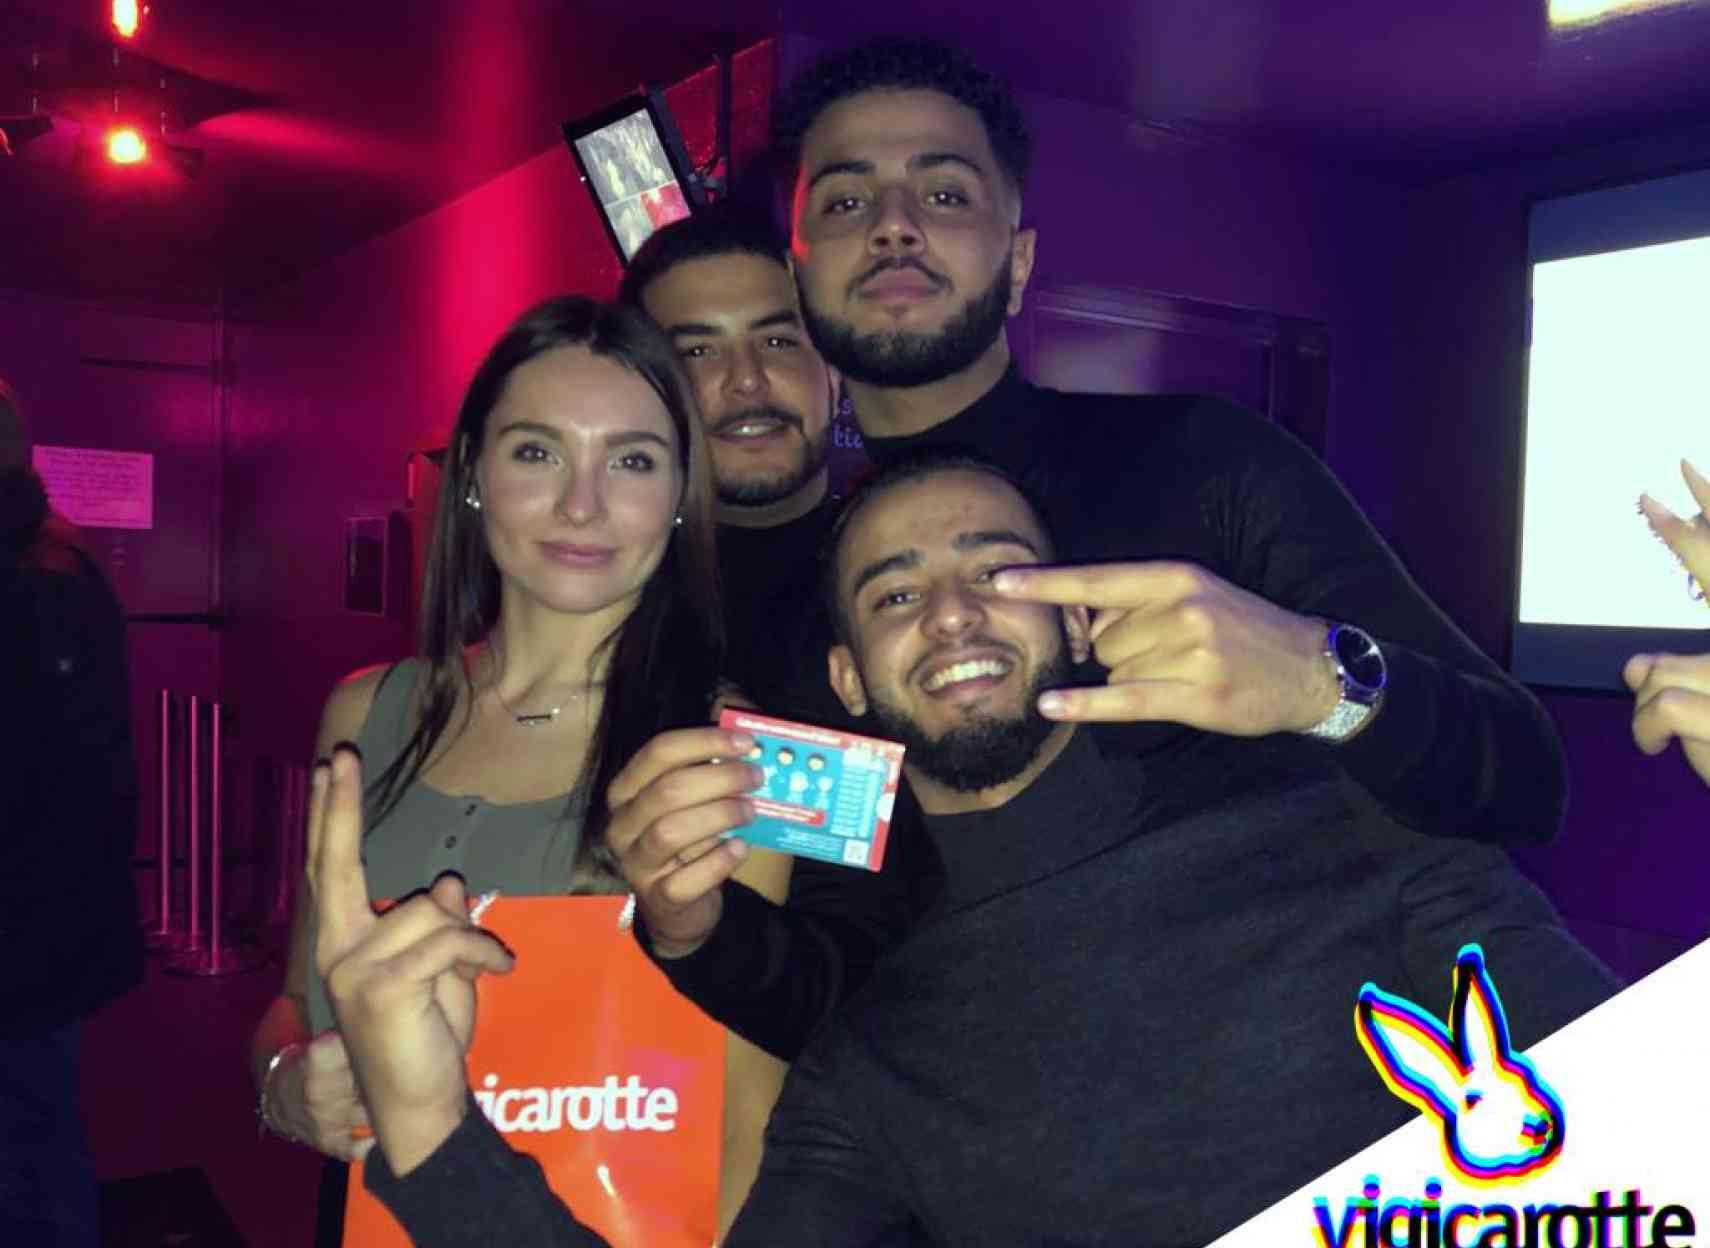 soirée vigicarotte Le Nyx Club